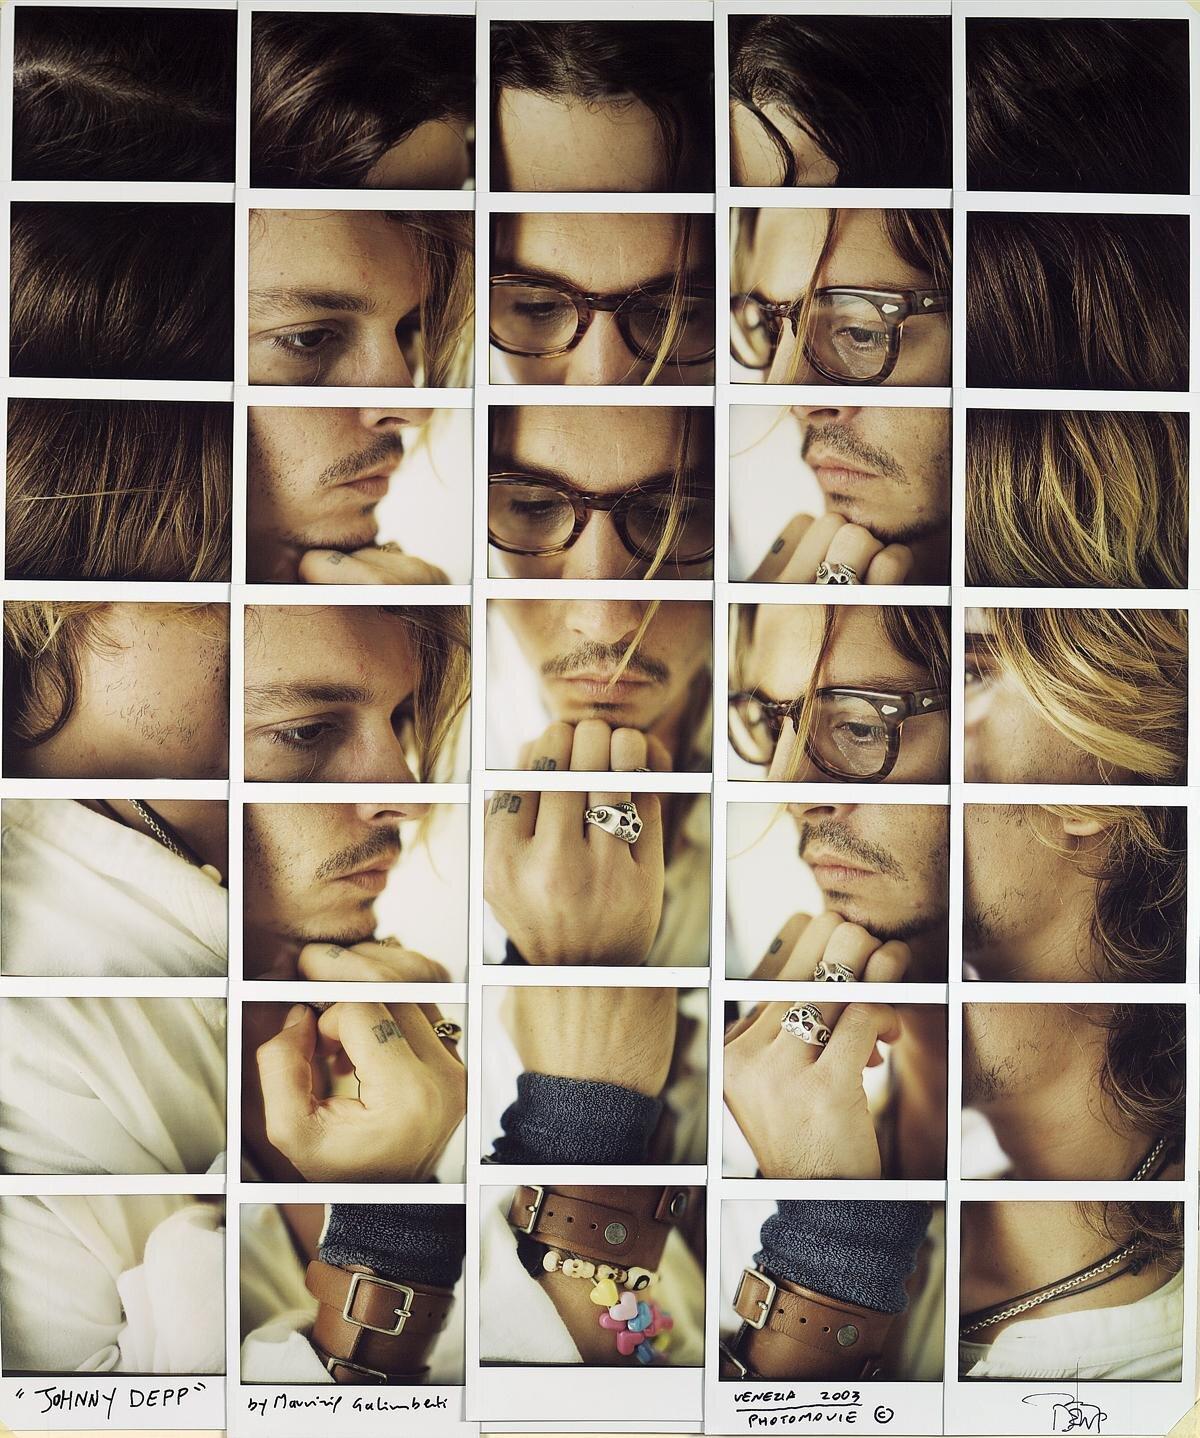 Intervista: Maurizio Galimberti – Celebrity Instant Film Collages